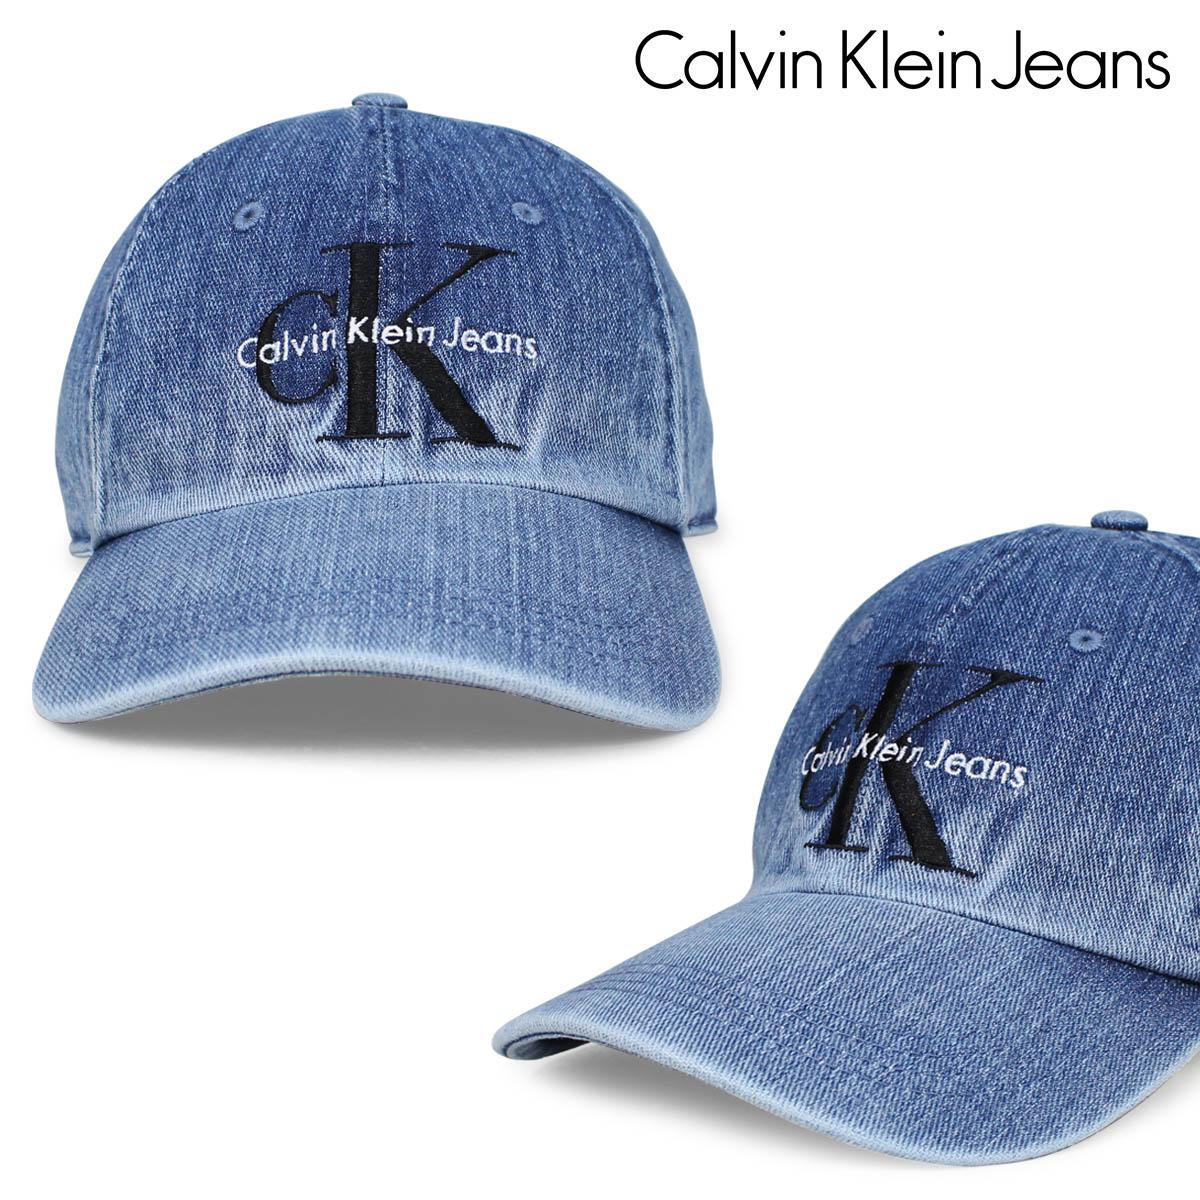 f15feff3672e Calvin Klein Jeans jeans Calvin Klein cap hat men gap Dis SPECIALITY CAP  blue 41VH900 ...